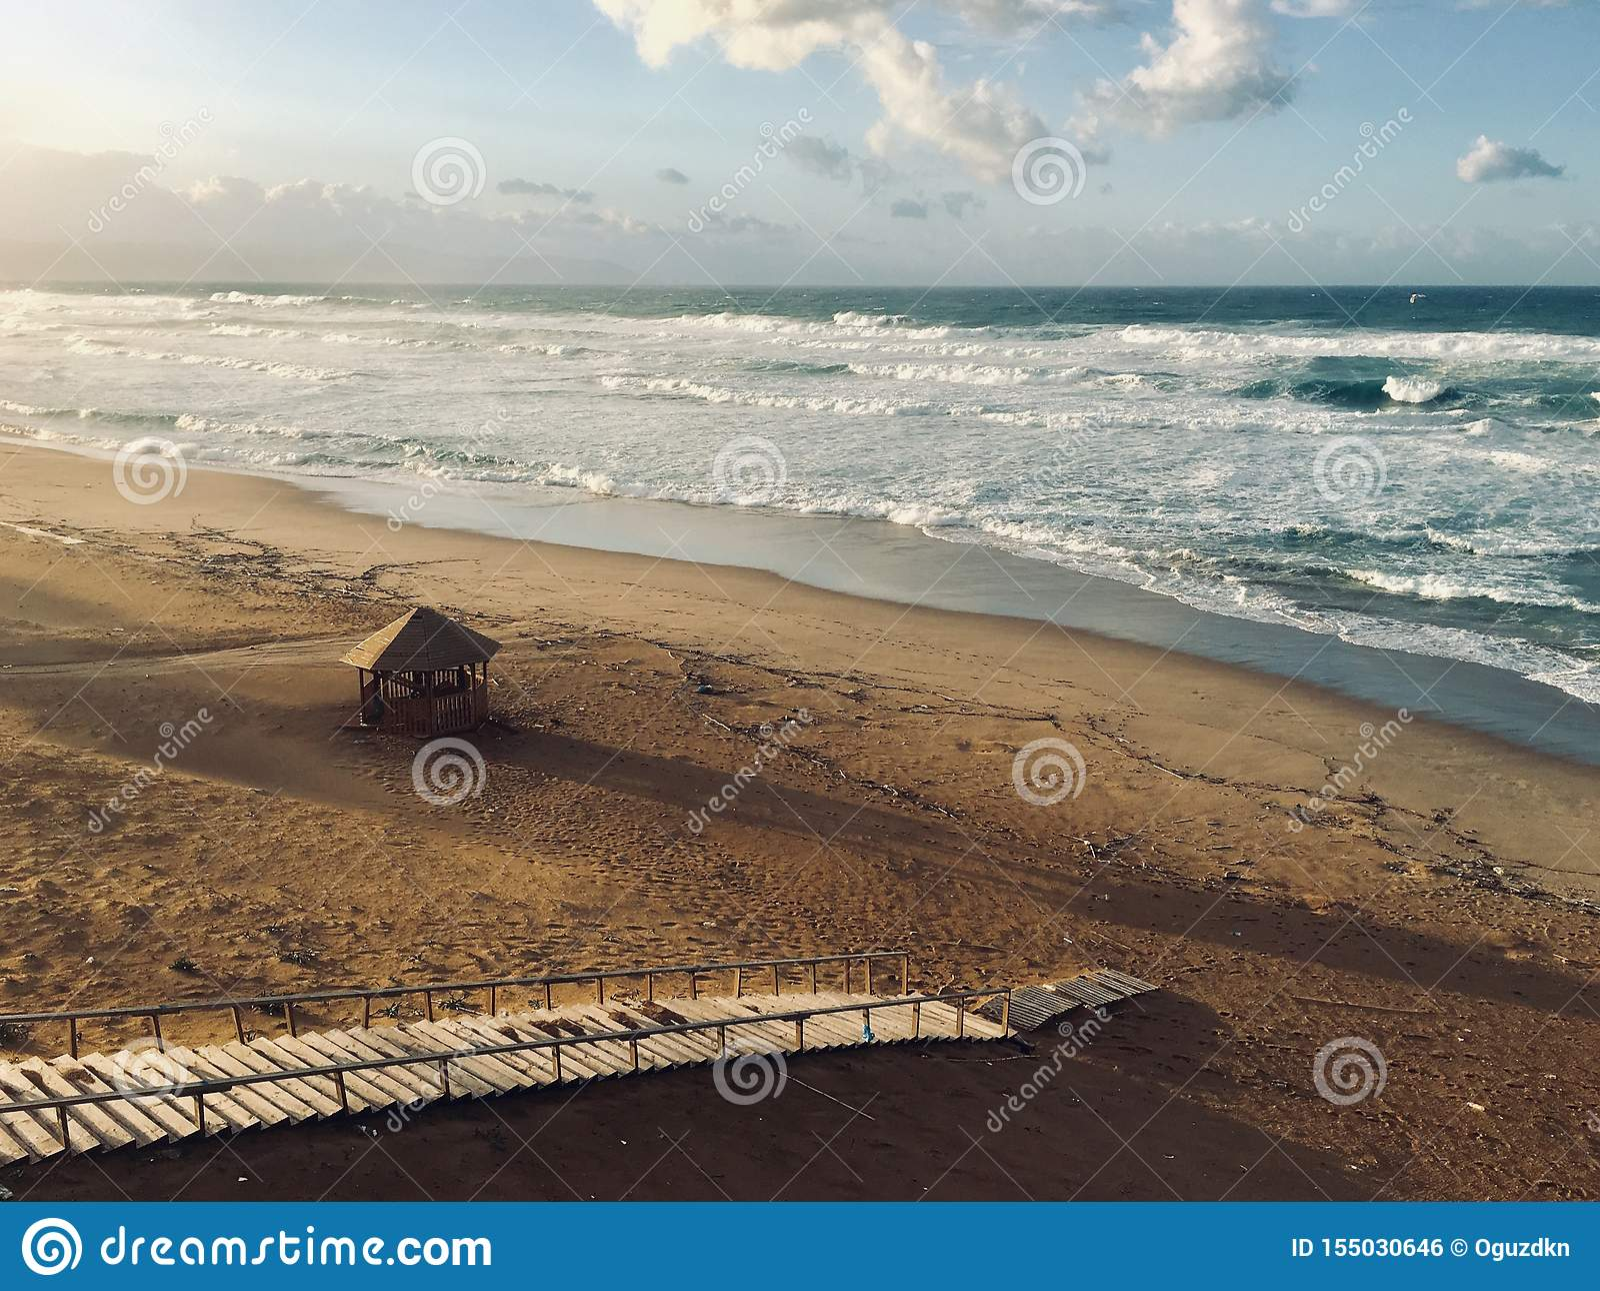 Panorama of virgin Mediterranean seashore landscape in Skikda, Algeria